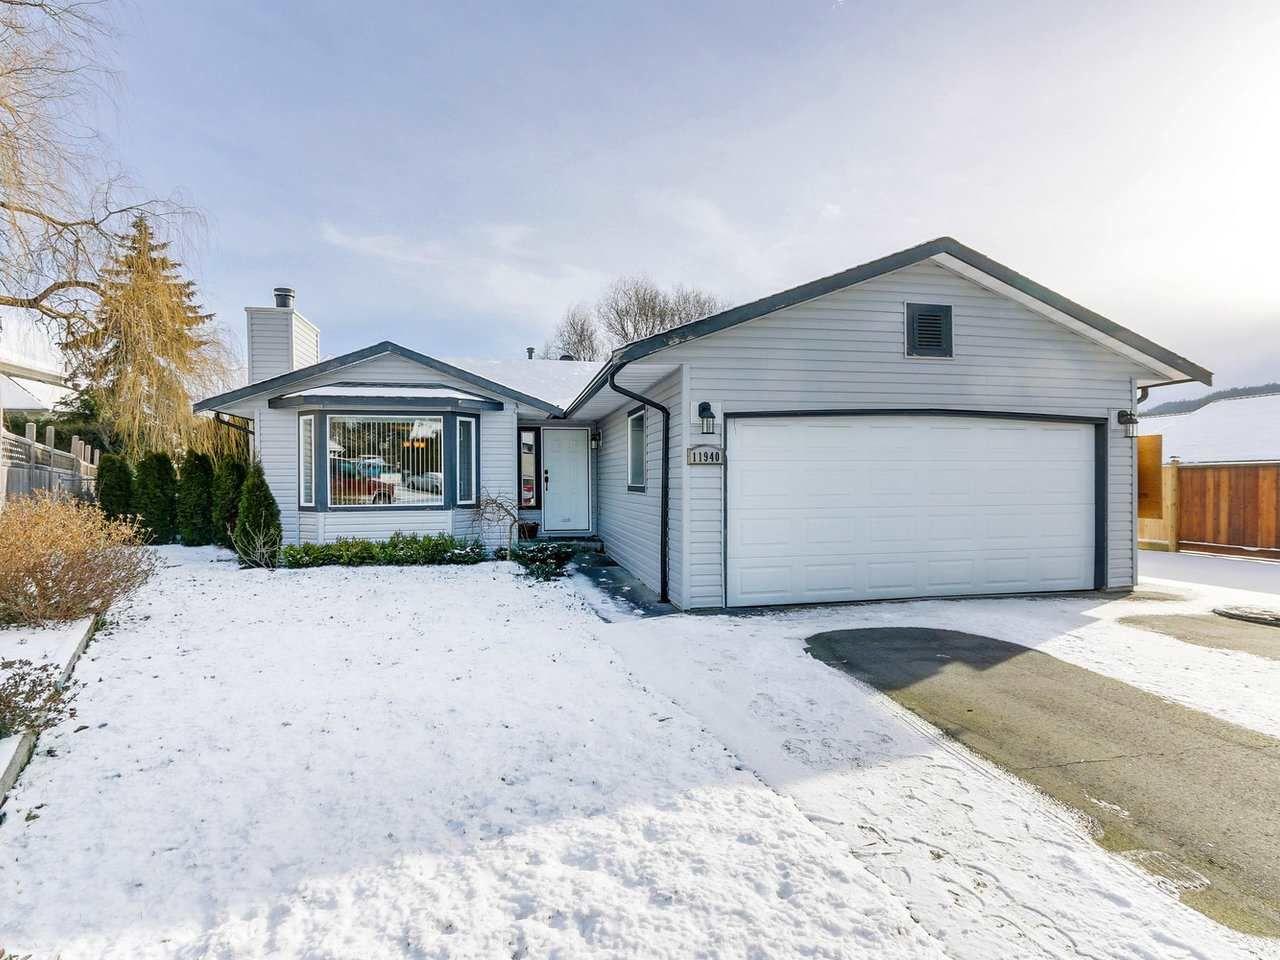 Main Photo: 11940 249 Street in Maple Ridge: Websters Corners House for sale : MLS®# R2338978